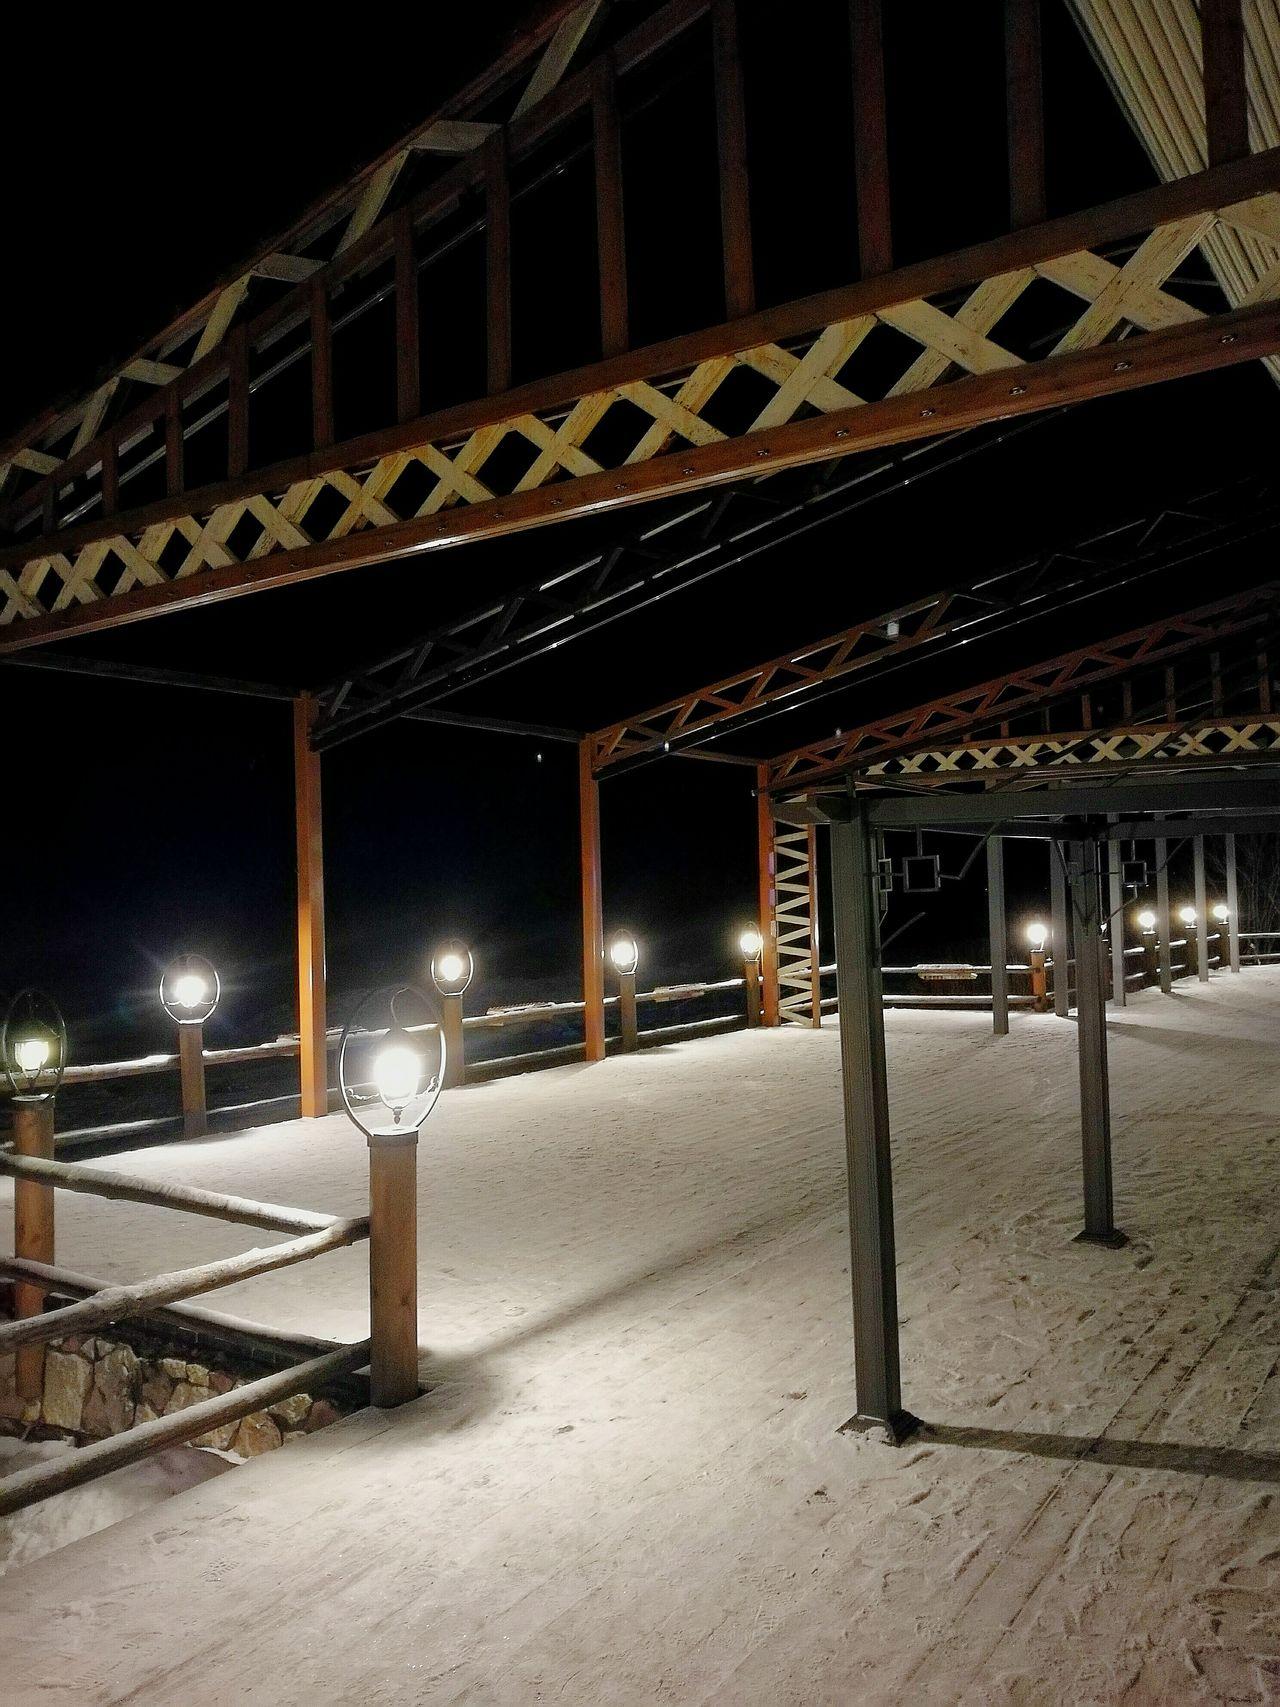 Illuminated Night Architecture No People